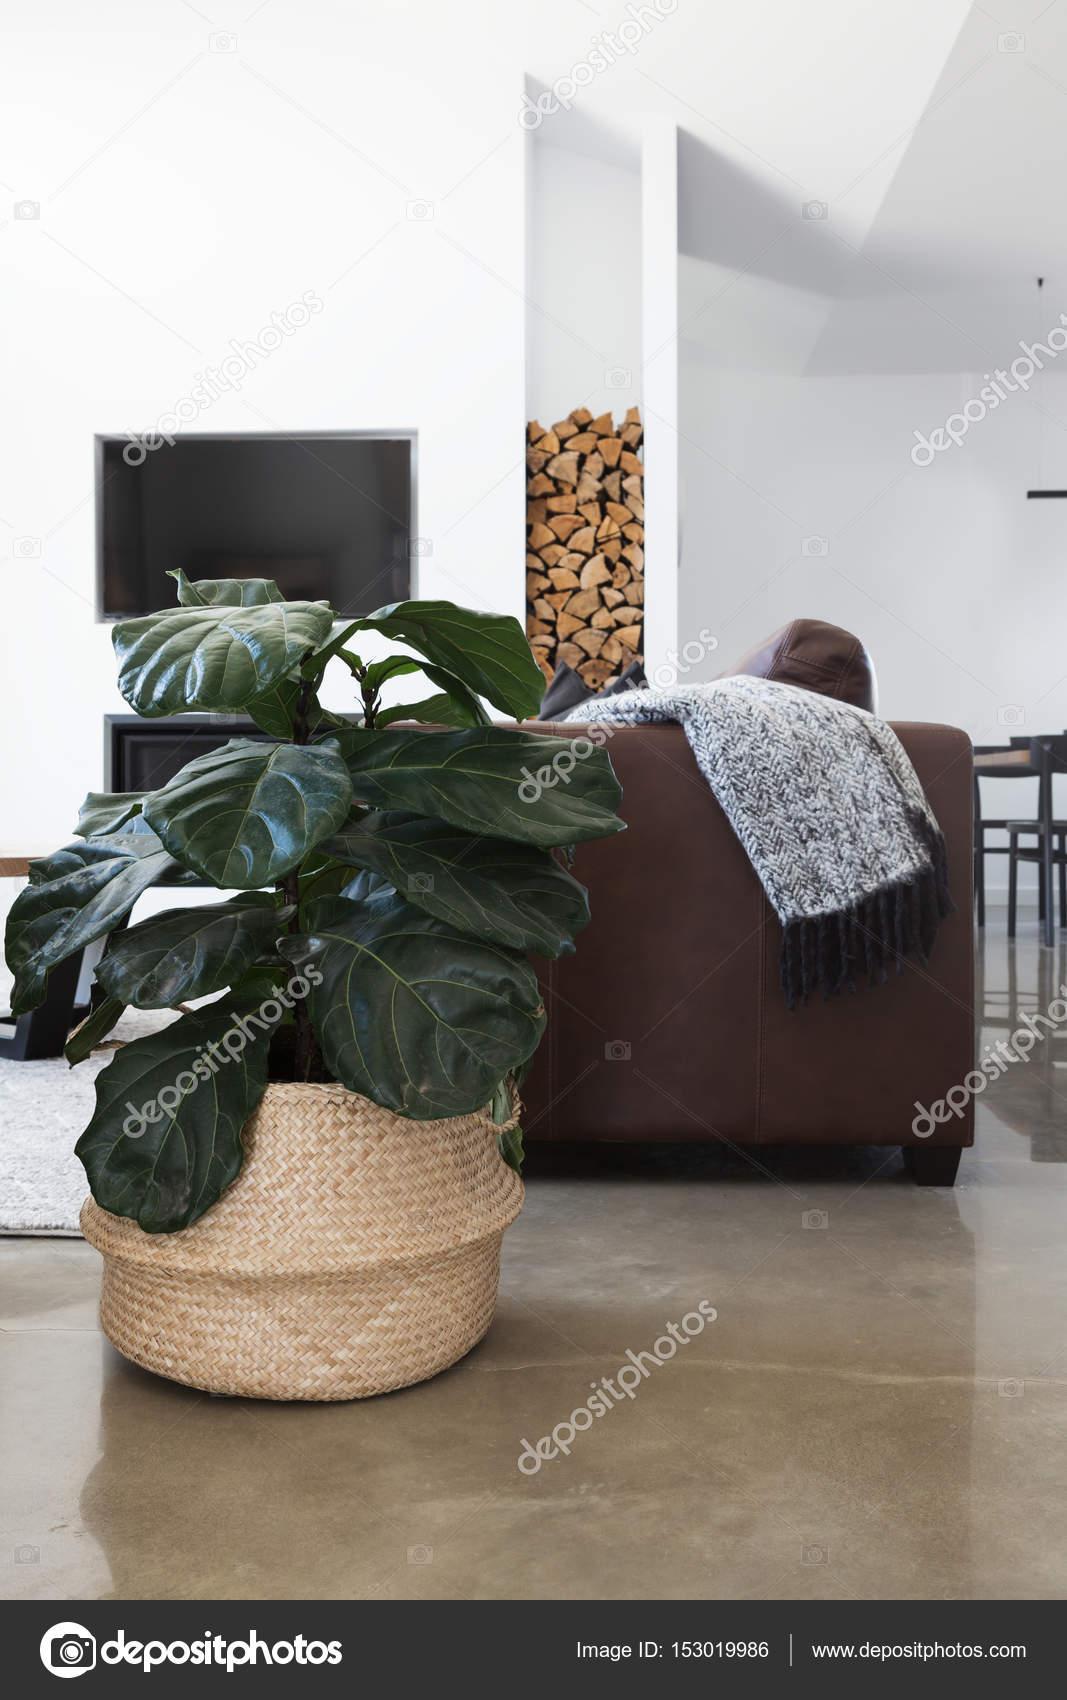 plant in moderne woonkamer — Stockfoto © jodiejohnson #153019986